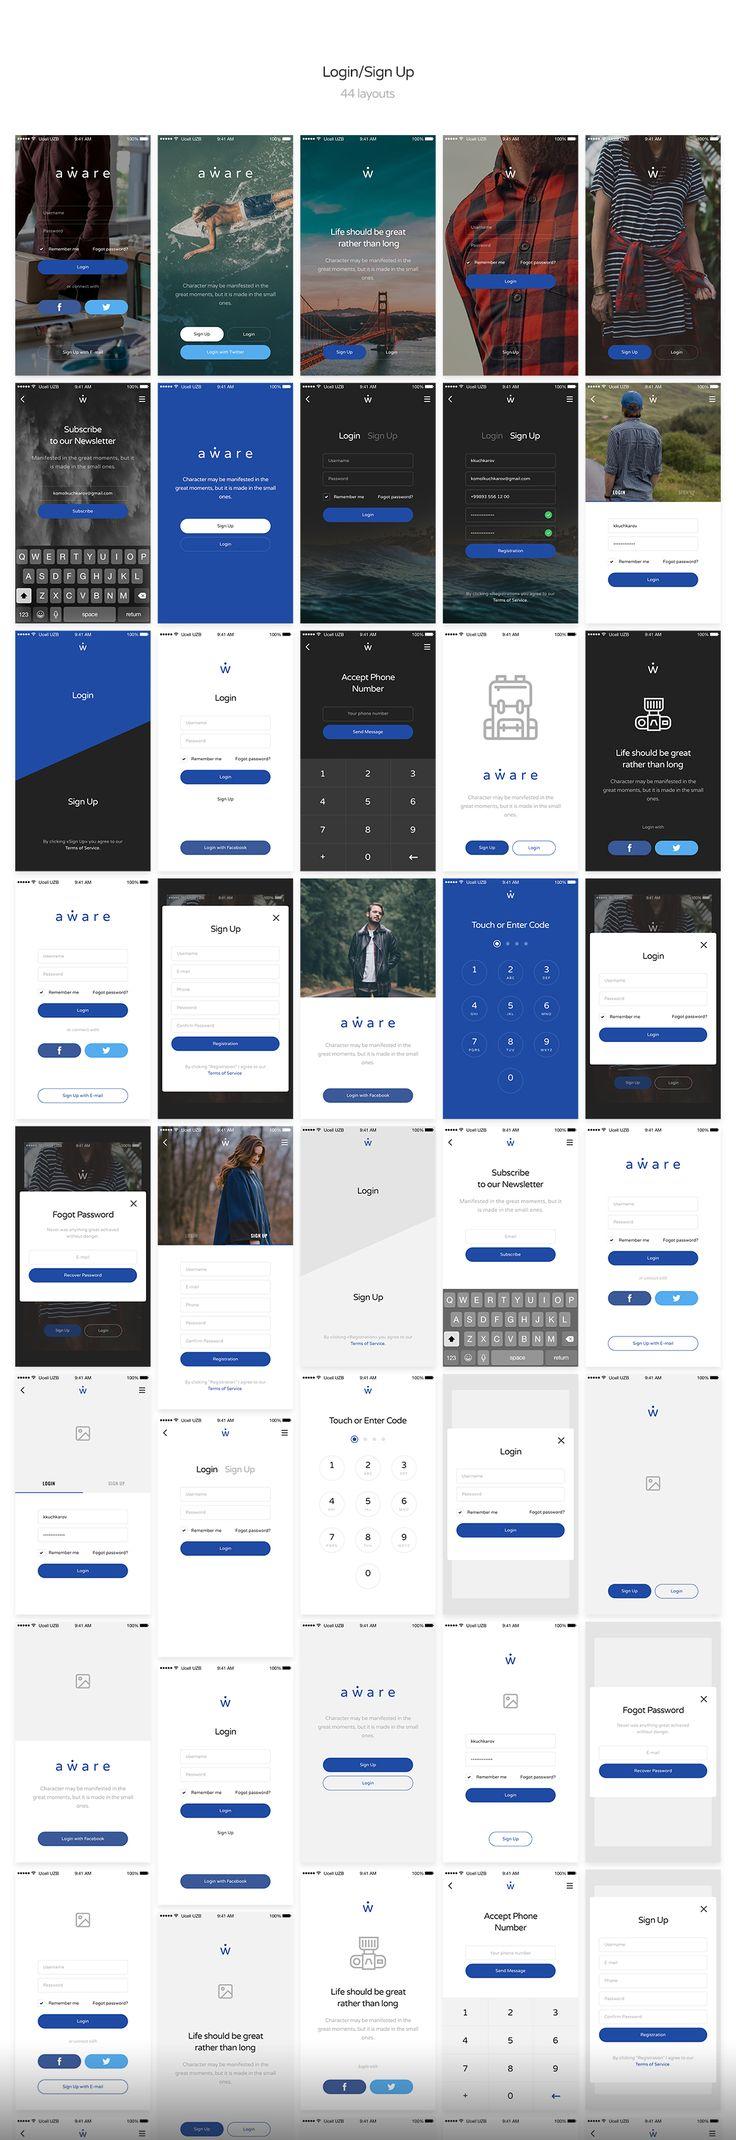 Aware Mobile UI/UX Kit-290+ Layouts by KK UI Store on @creativemarket